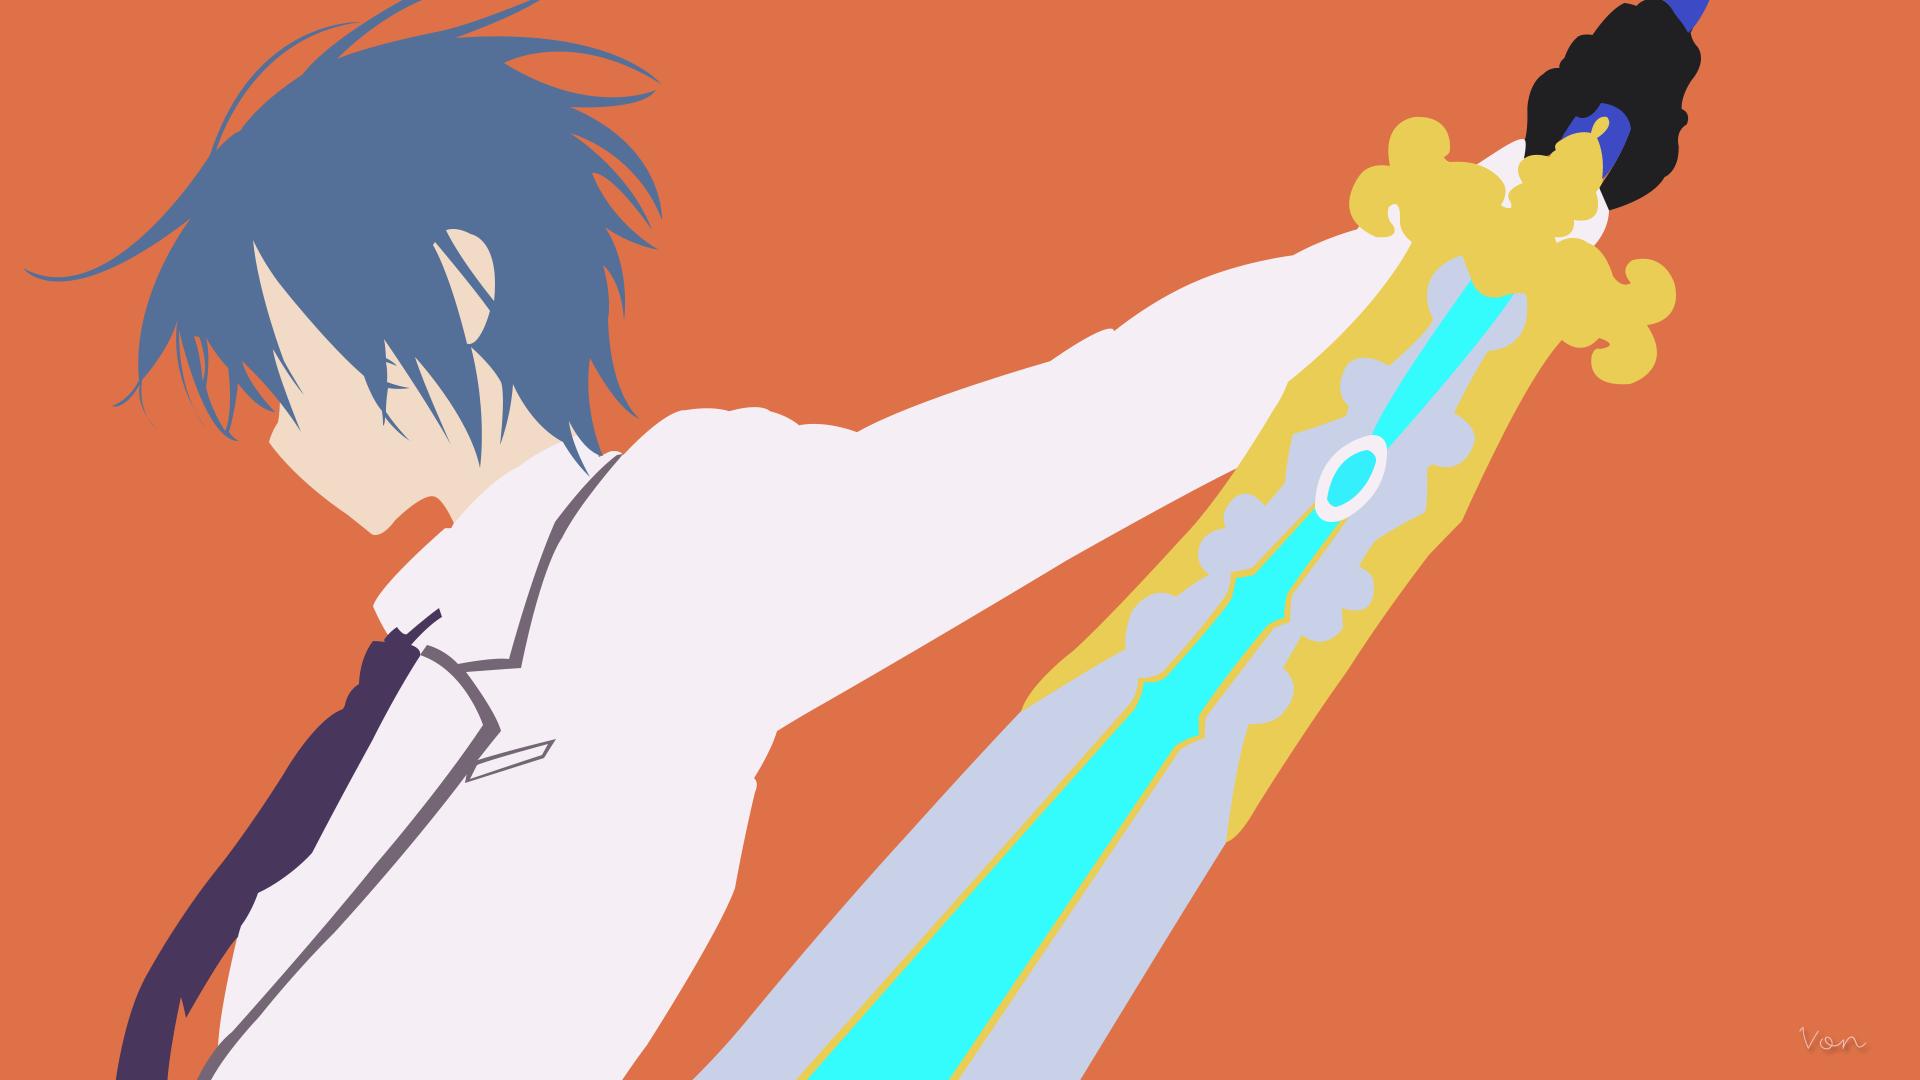 Kamito Kazehaya Seirei Tsukai No Blade Dance By Cahyovon On